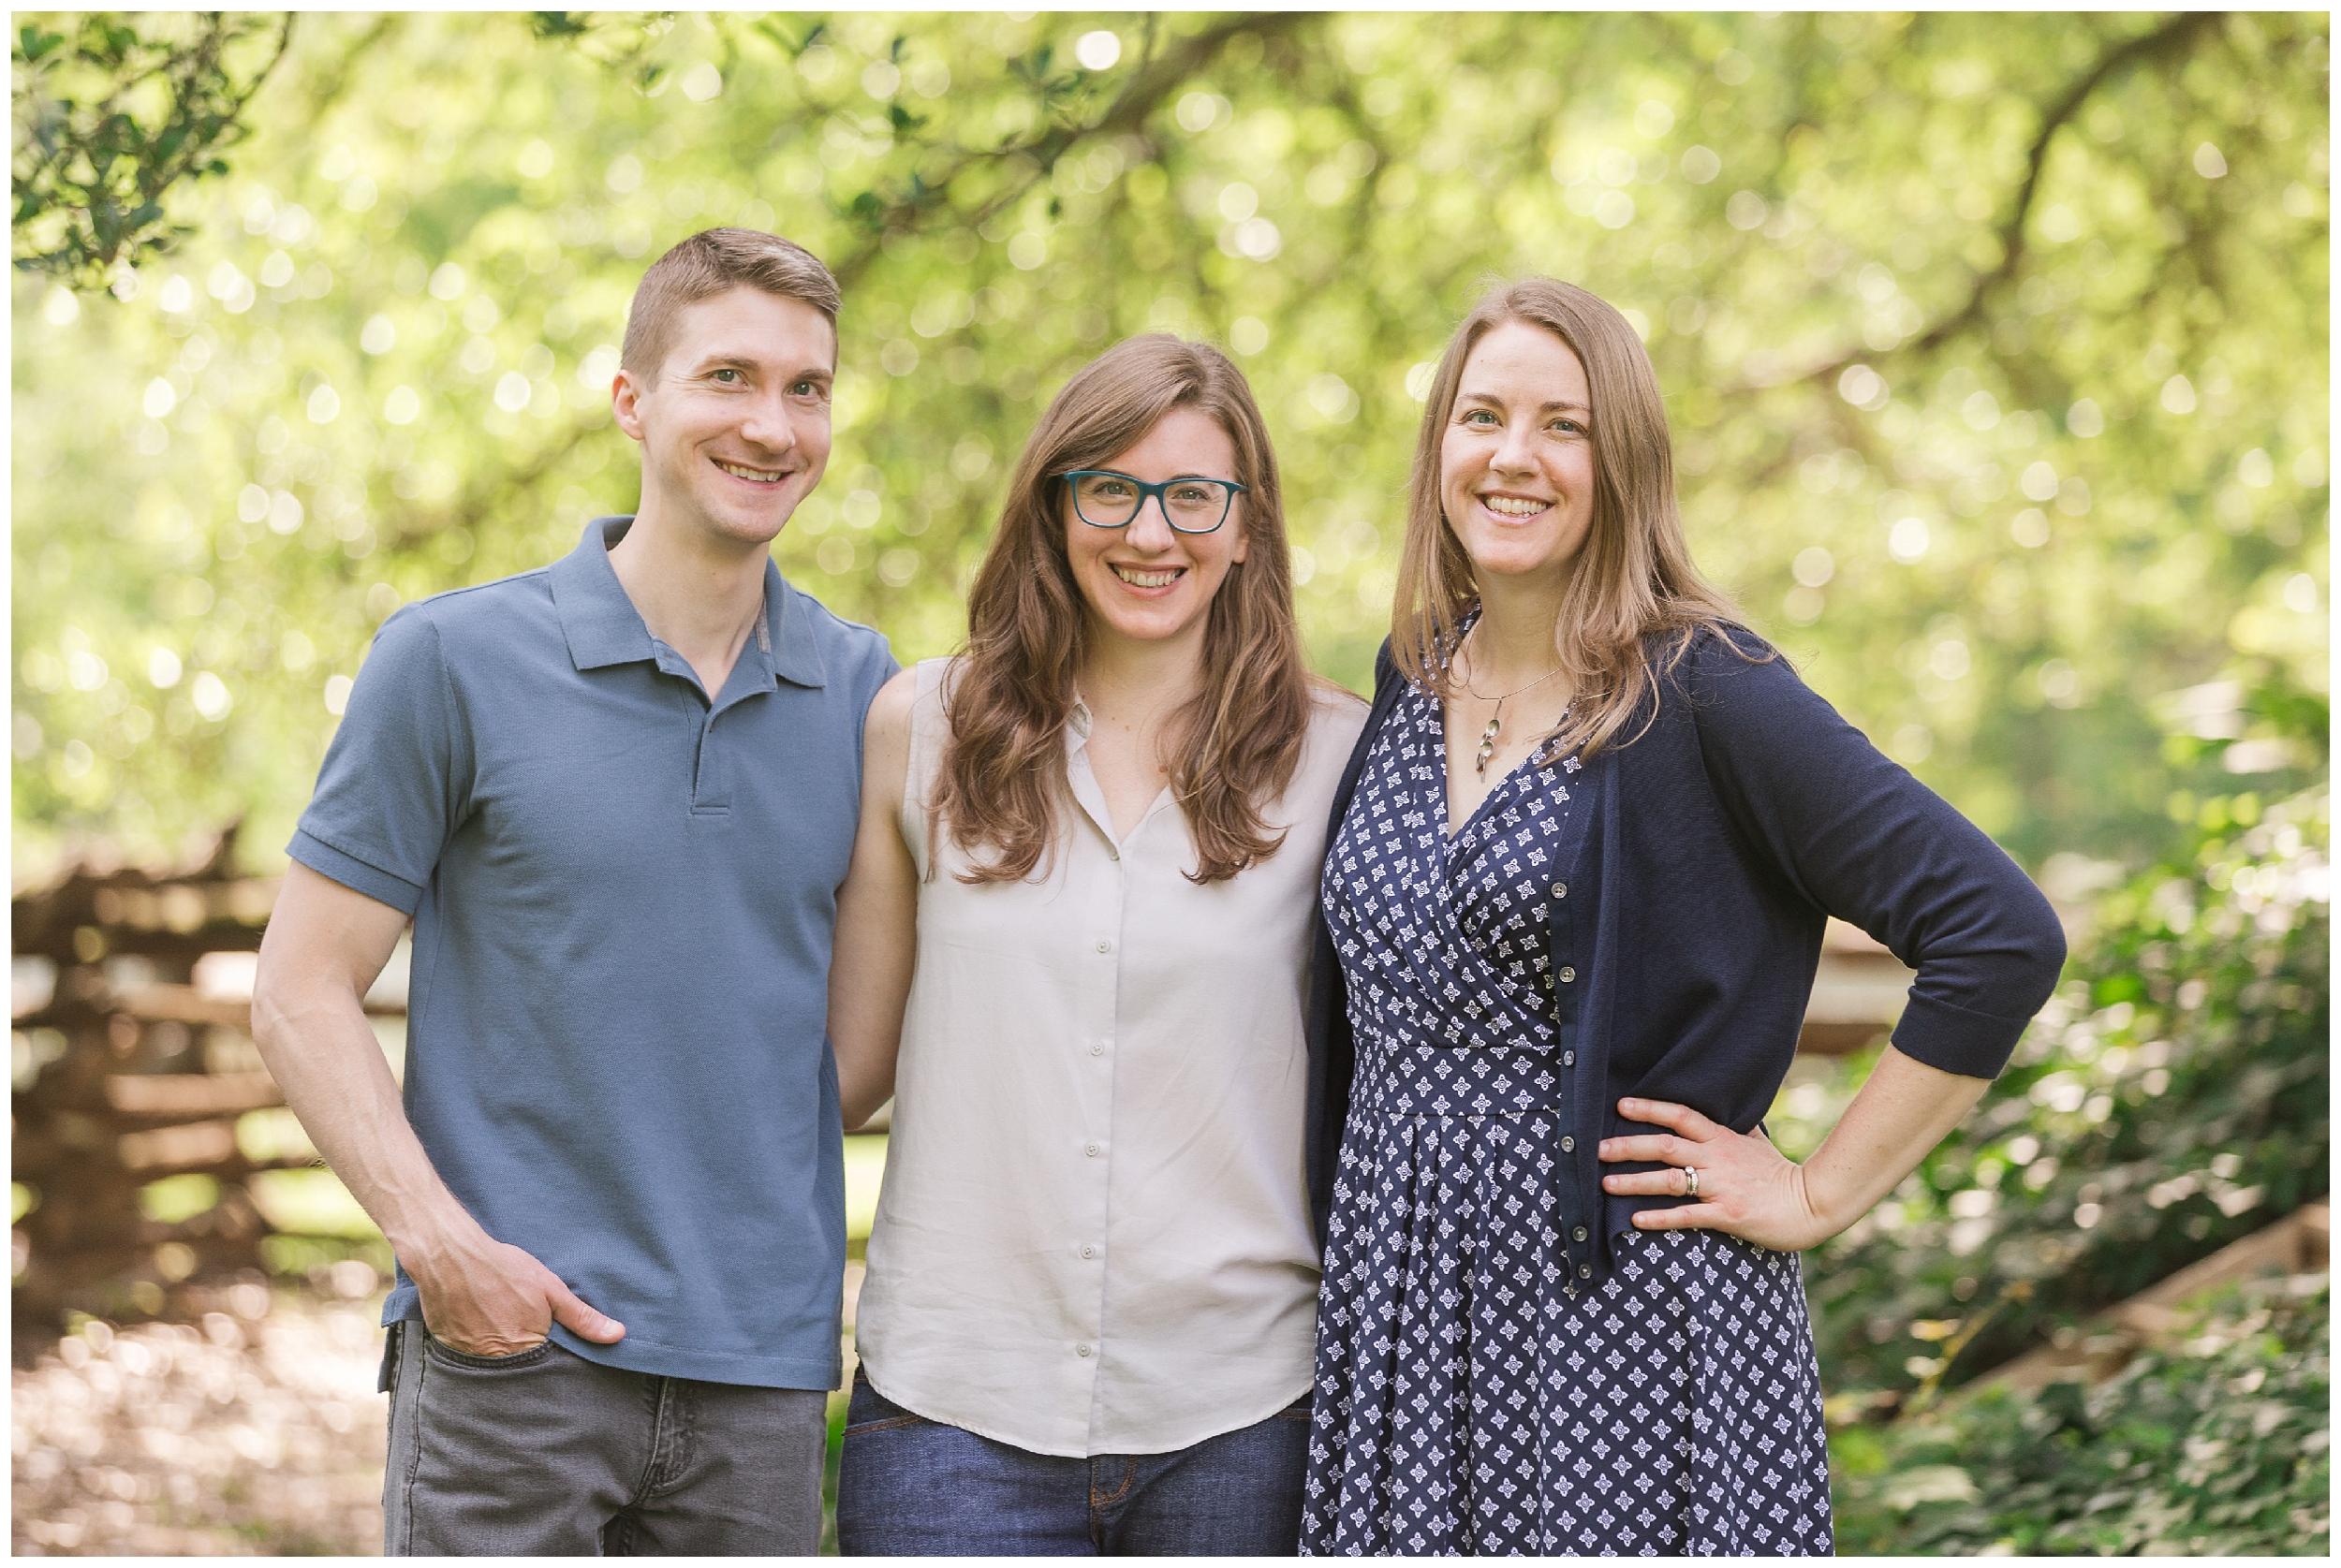 williamsburg family photography by elovephotos_0003.jpg